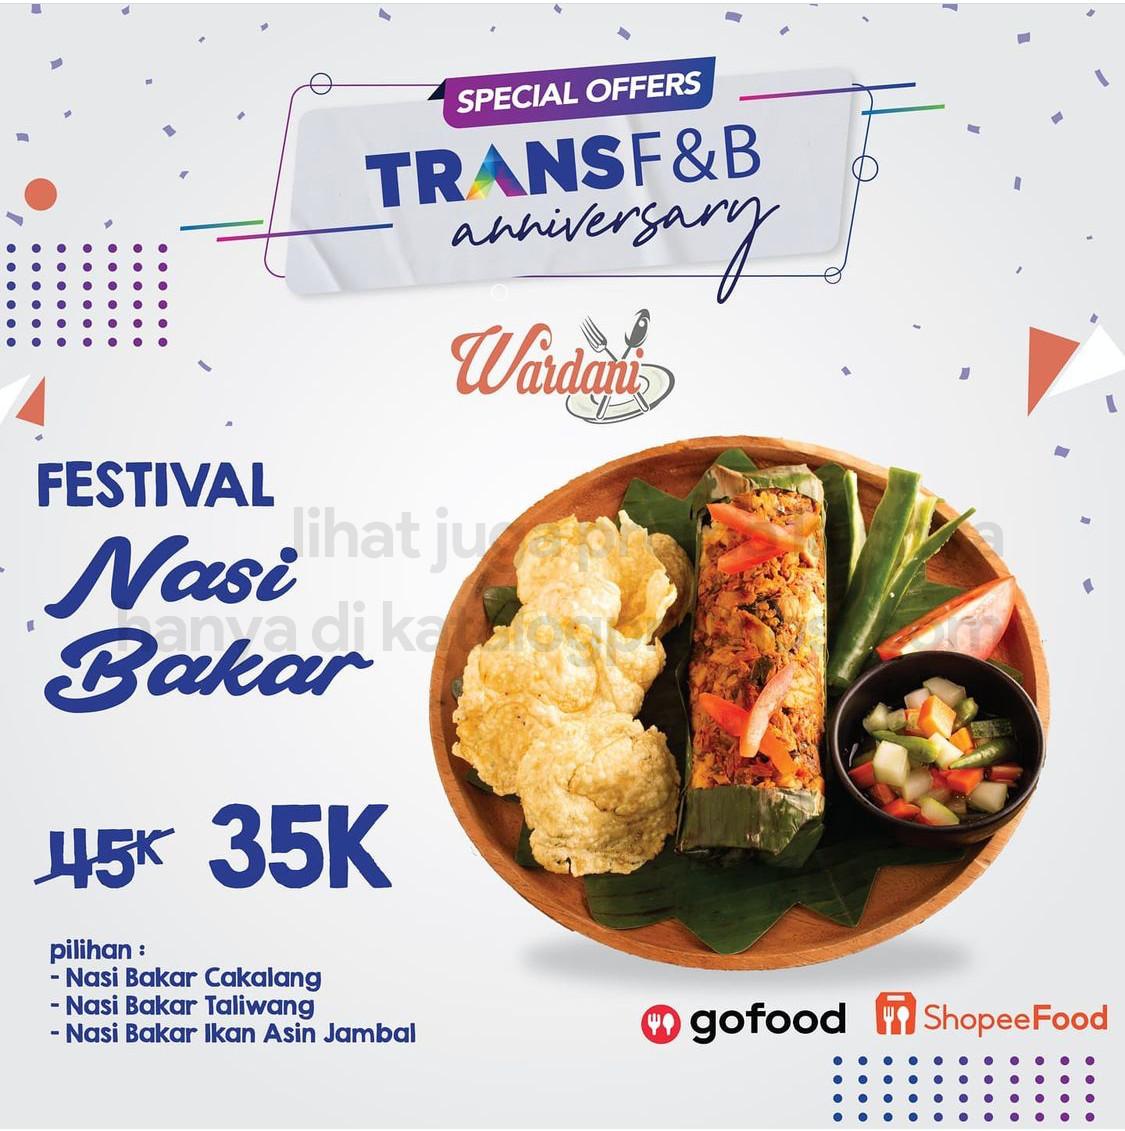 Warung Wardani Promo SPECIAL  ulang tahun TRANS F&B - Festival Nasi Bakar cuma 35ribu saja!